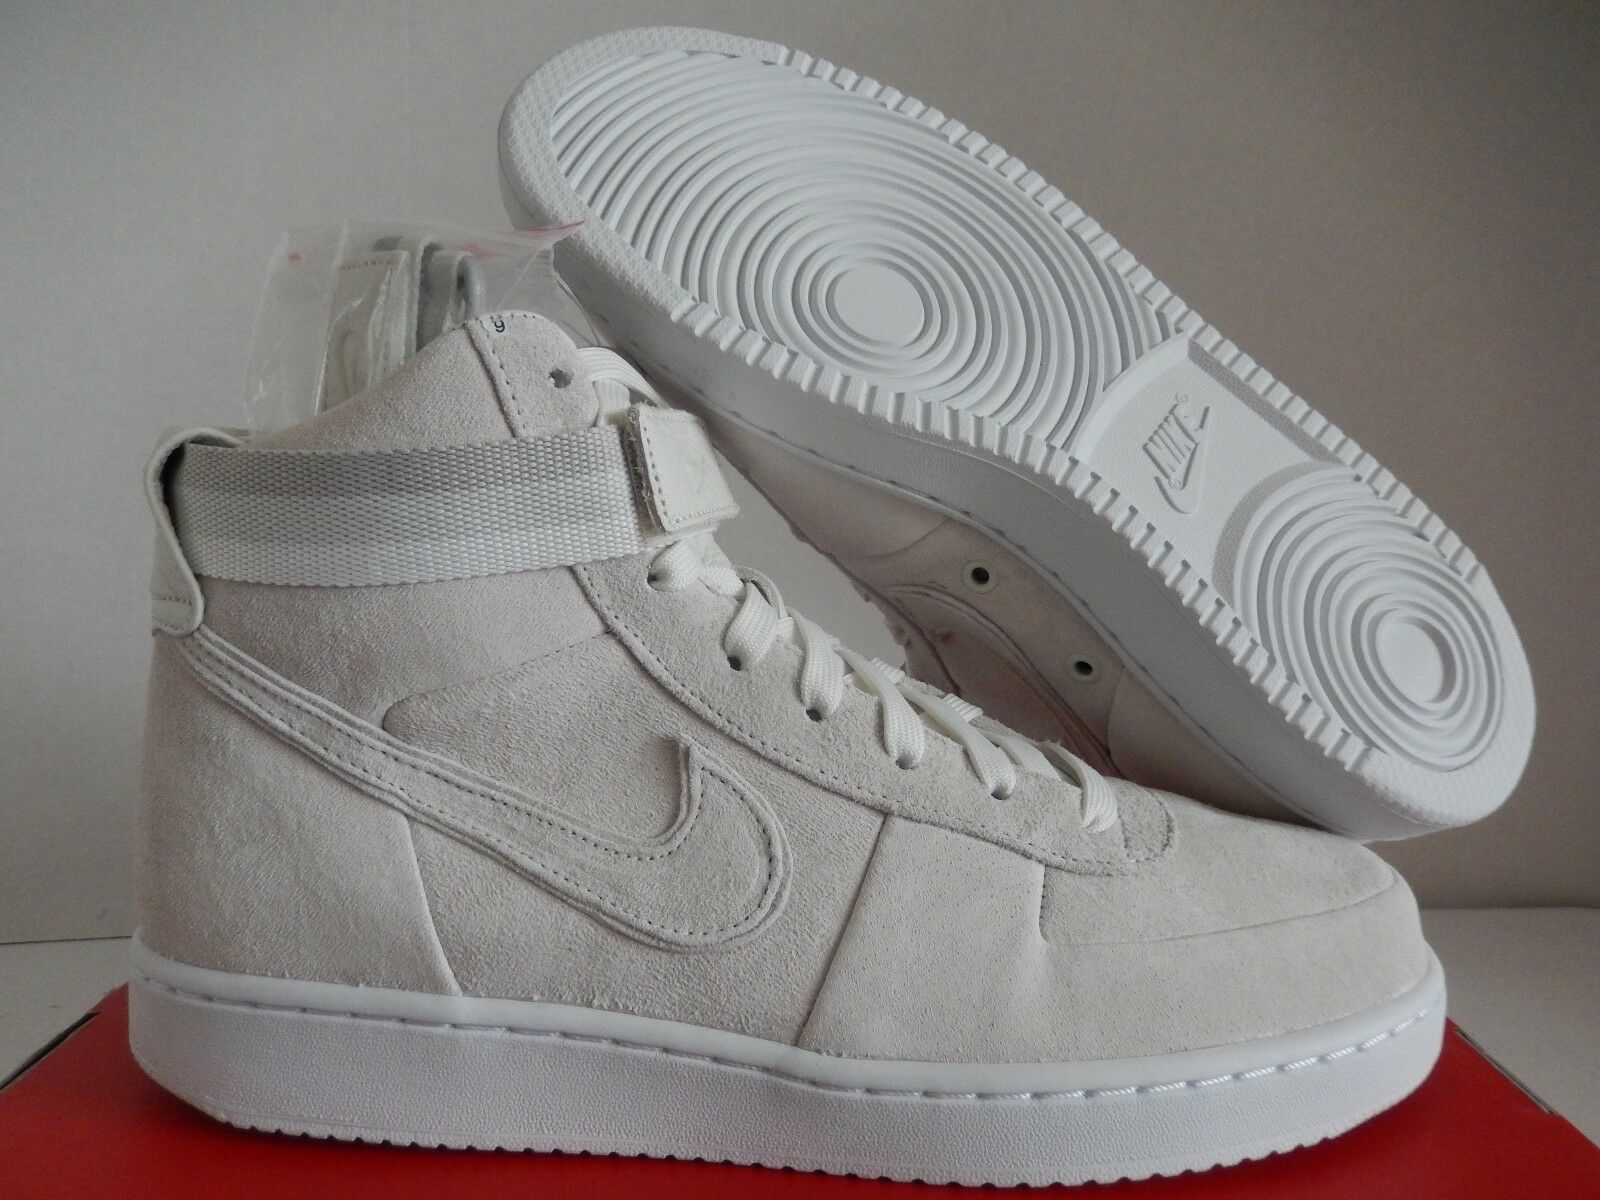 Nike vandalo alto premio premio alto sail-white ridotta a4f452